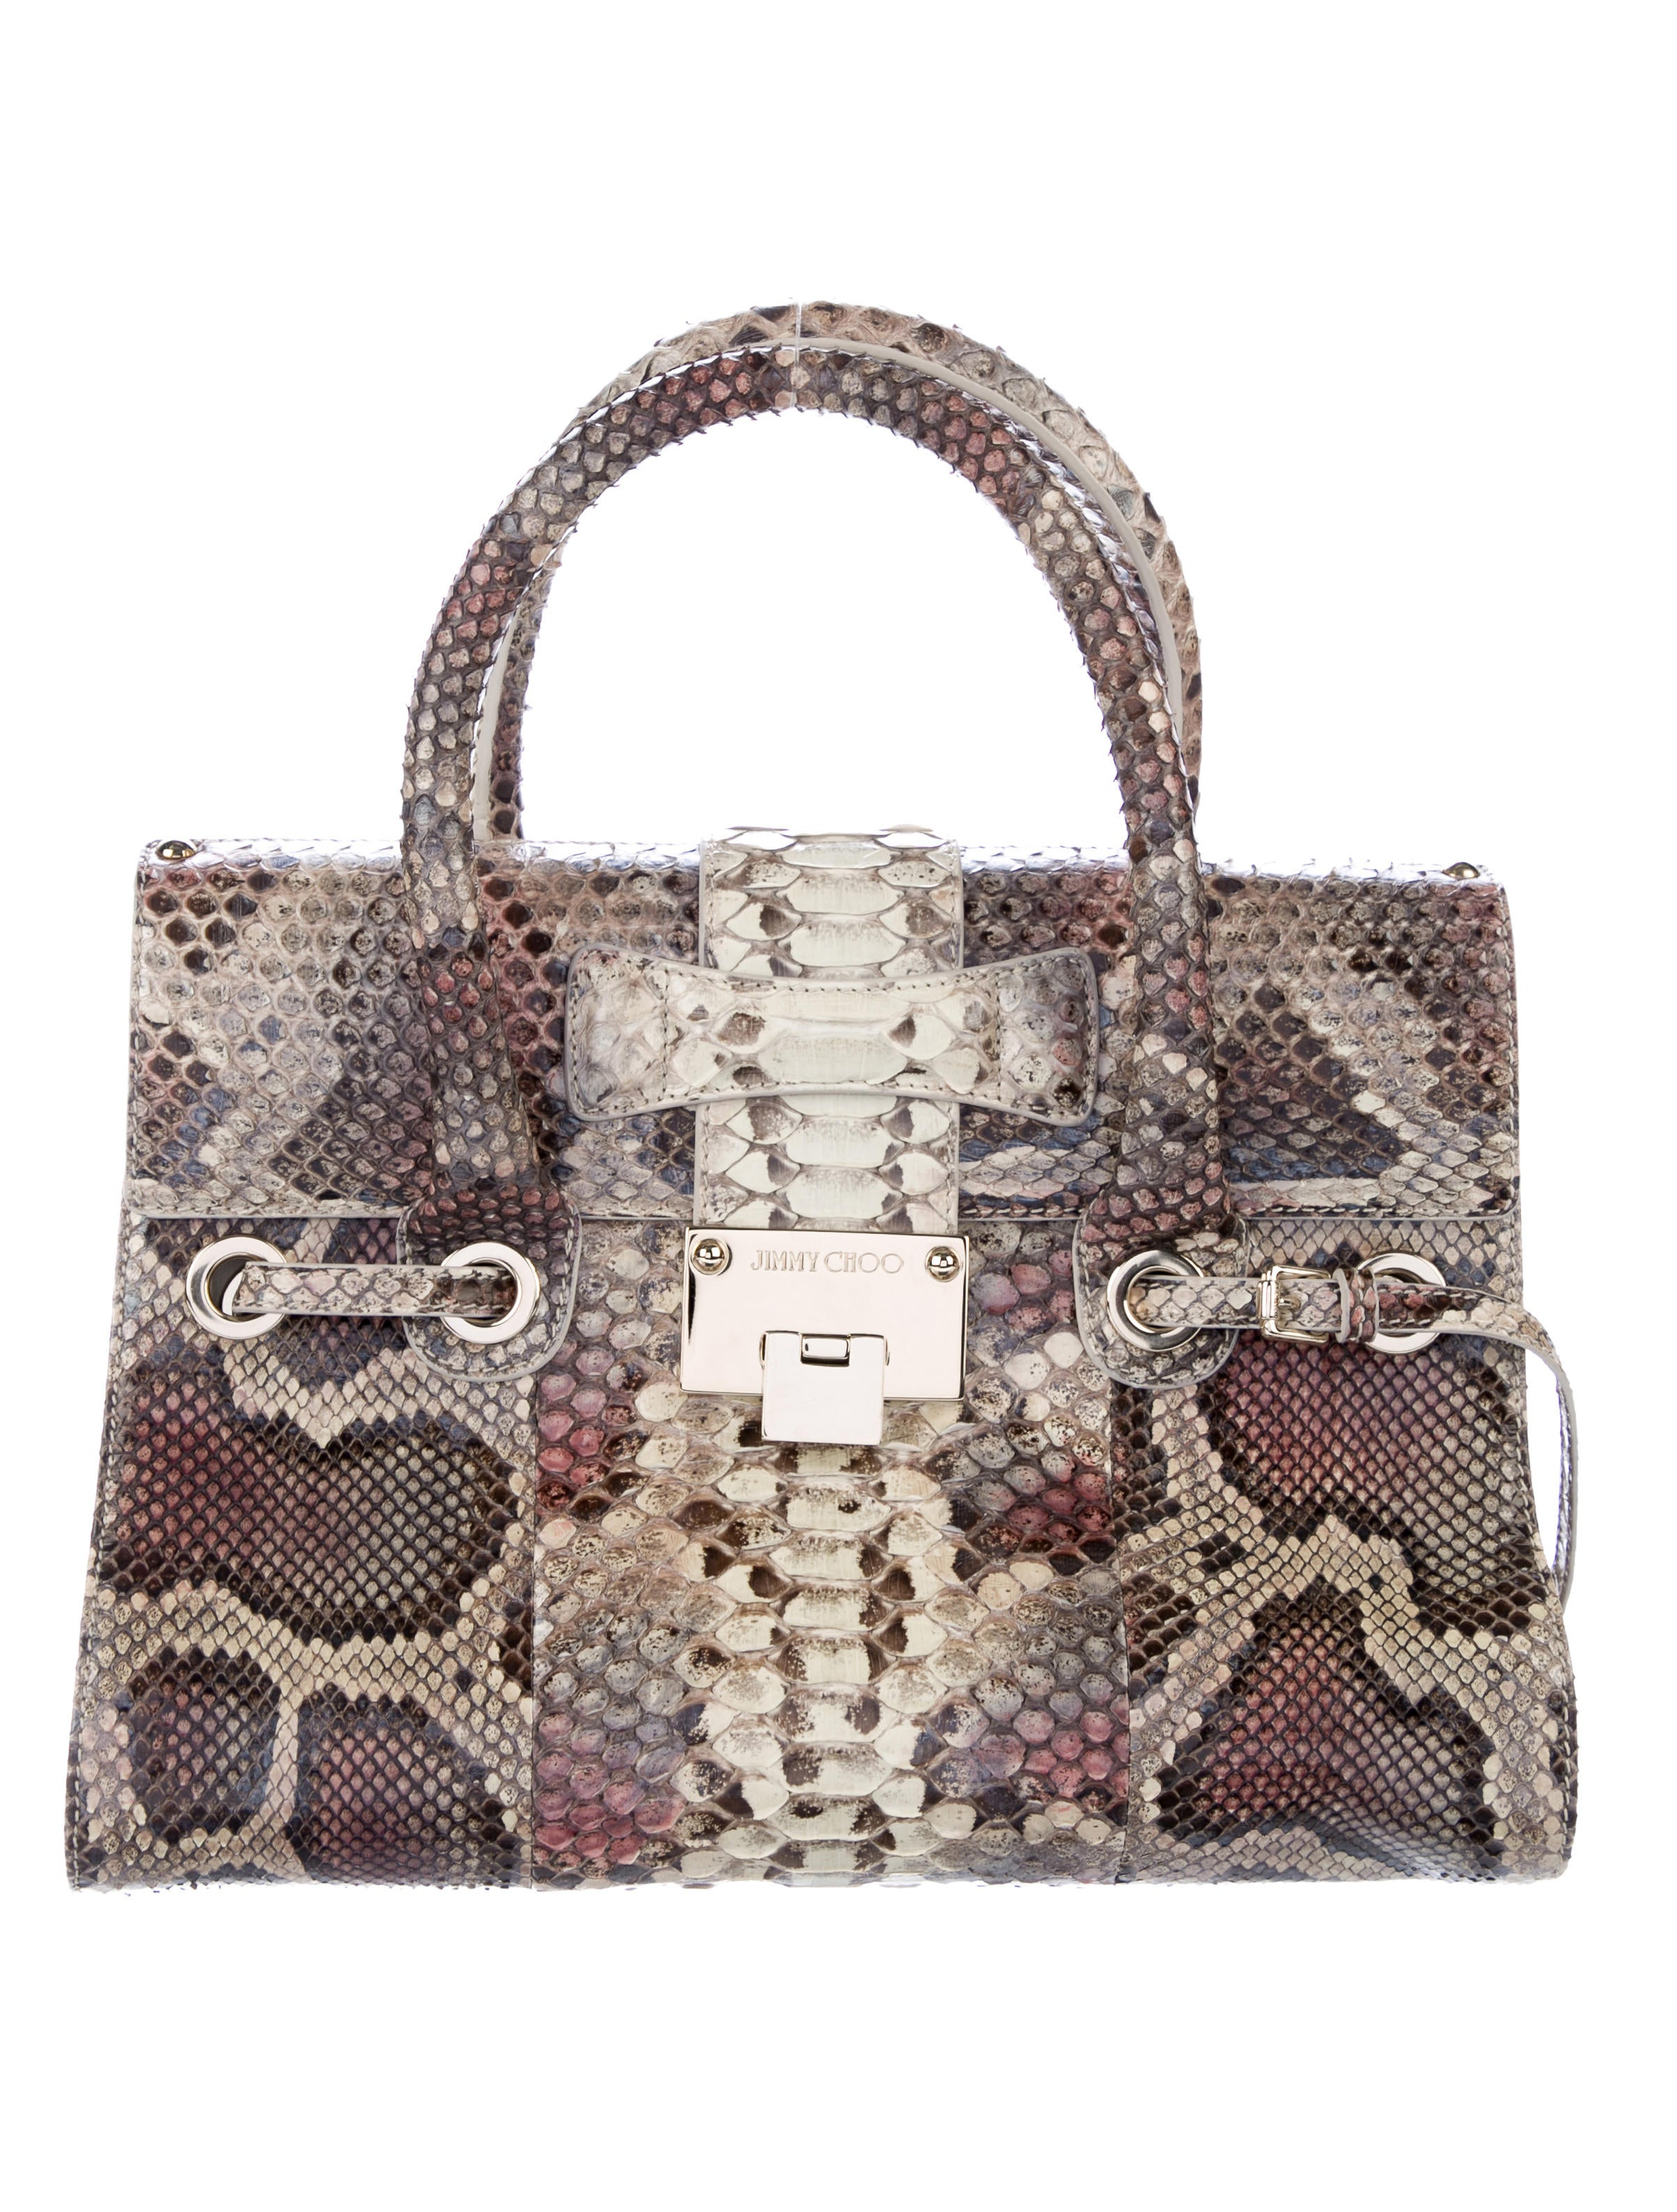 3d502537d3d4 Jimmy Choo Python Rosalie Bag - Handbags - JIM84261